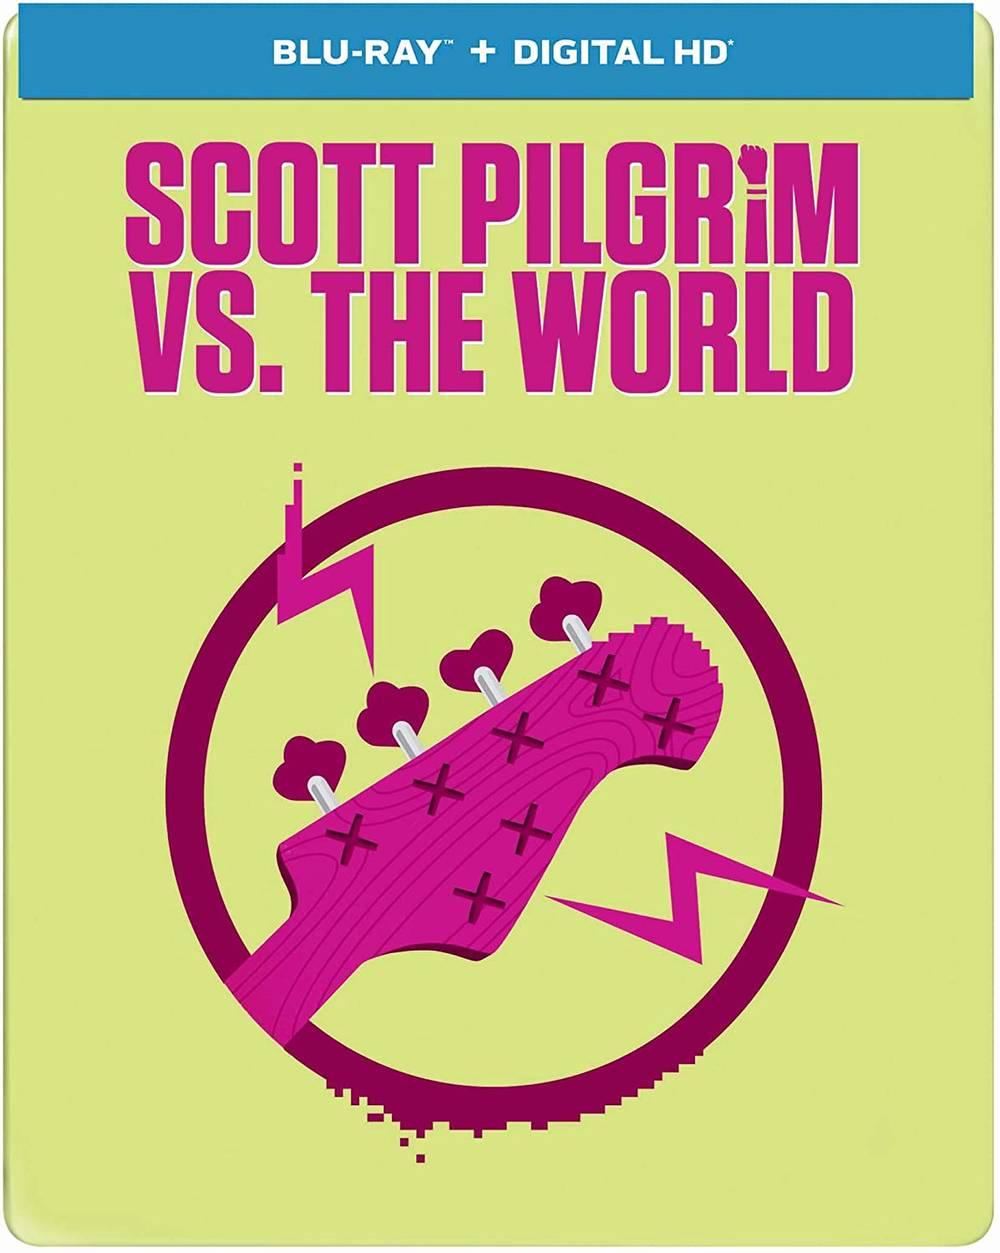 Scott Pilgrim vs. The World [Movie] - Scott Pilgrim vs. the World [Limited Edition Steelbook]